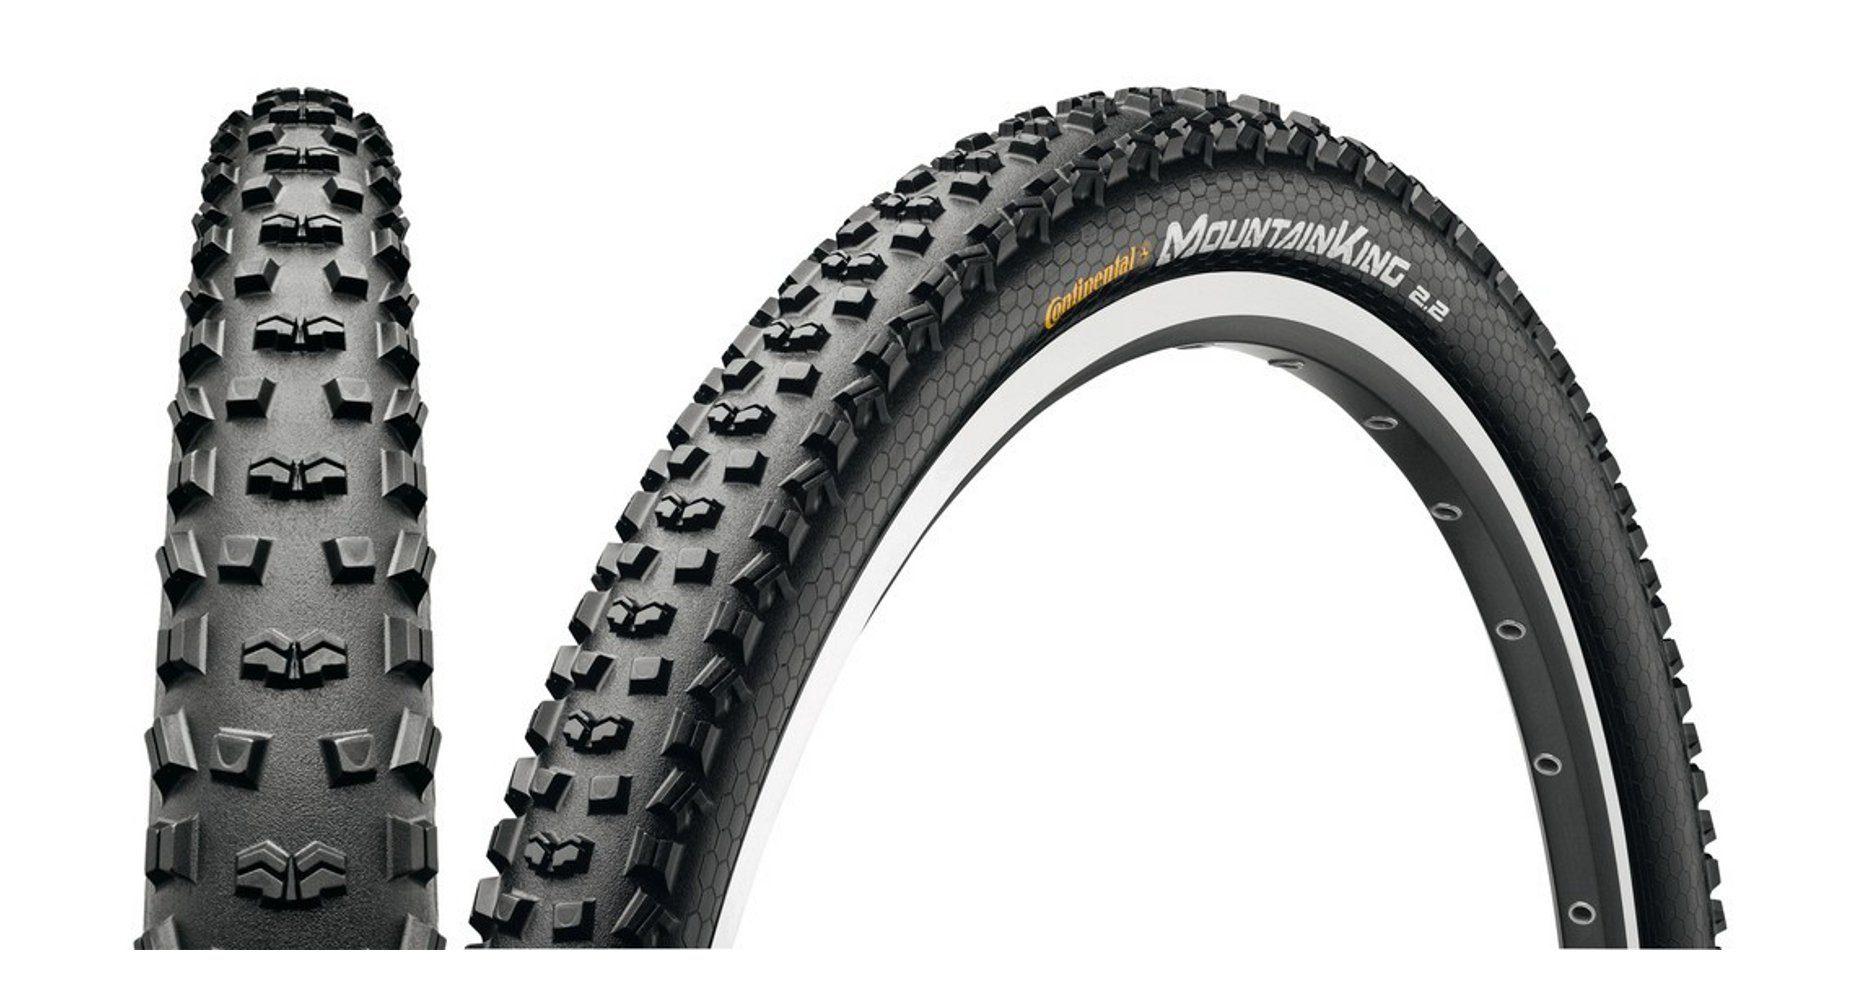 Continental Fahrradreifen »Mountain King 2.2 Sport 27,5 Zoll Draht Skin«